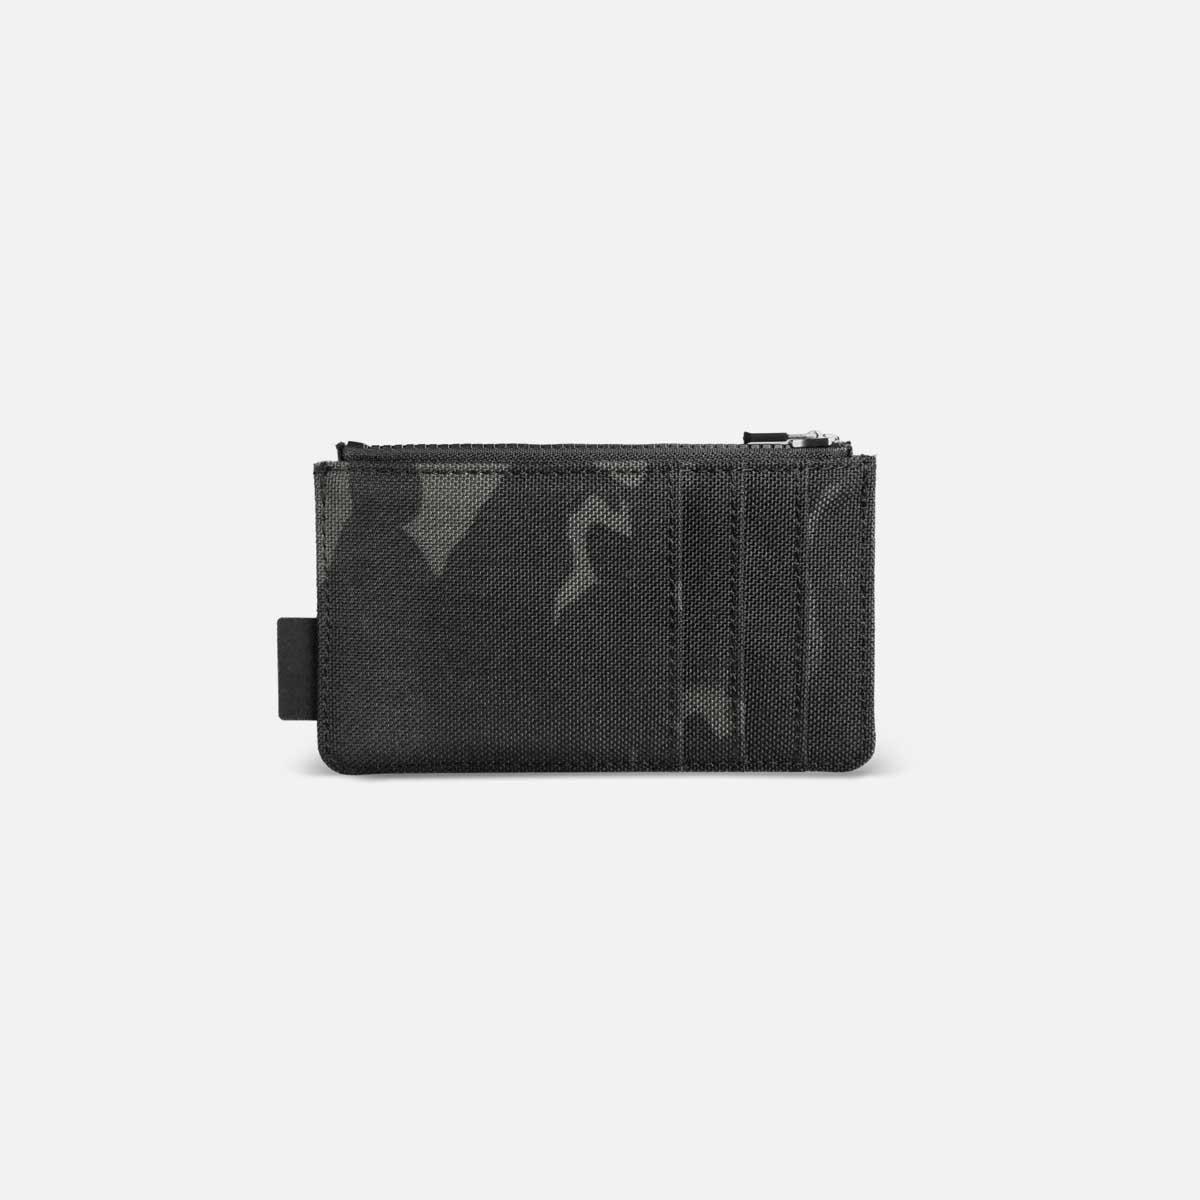 44004_cardholder_blackcamo_back.jpg